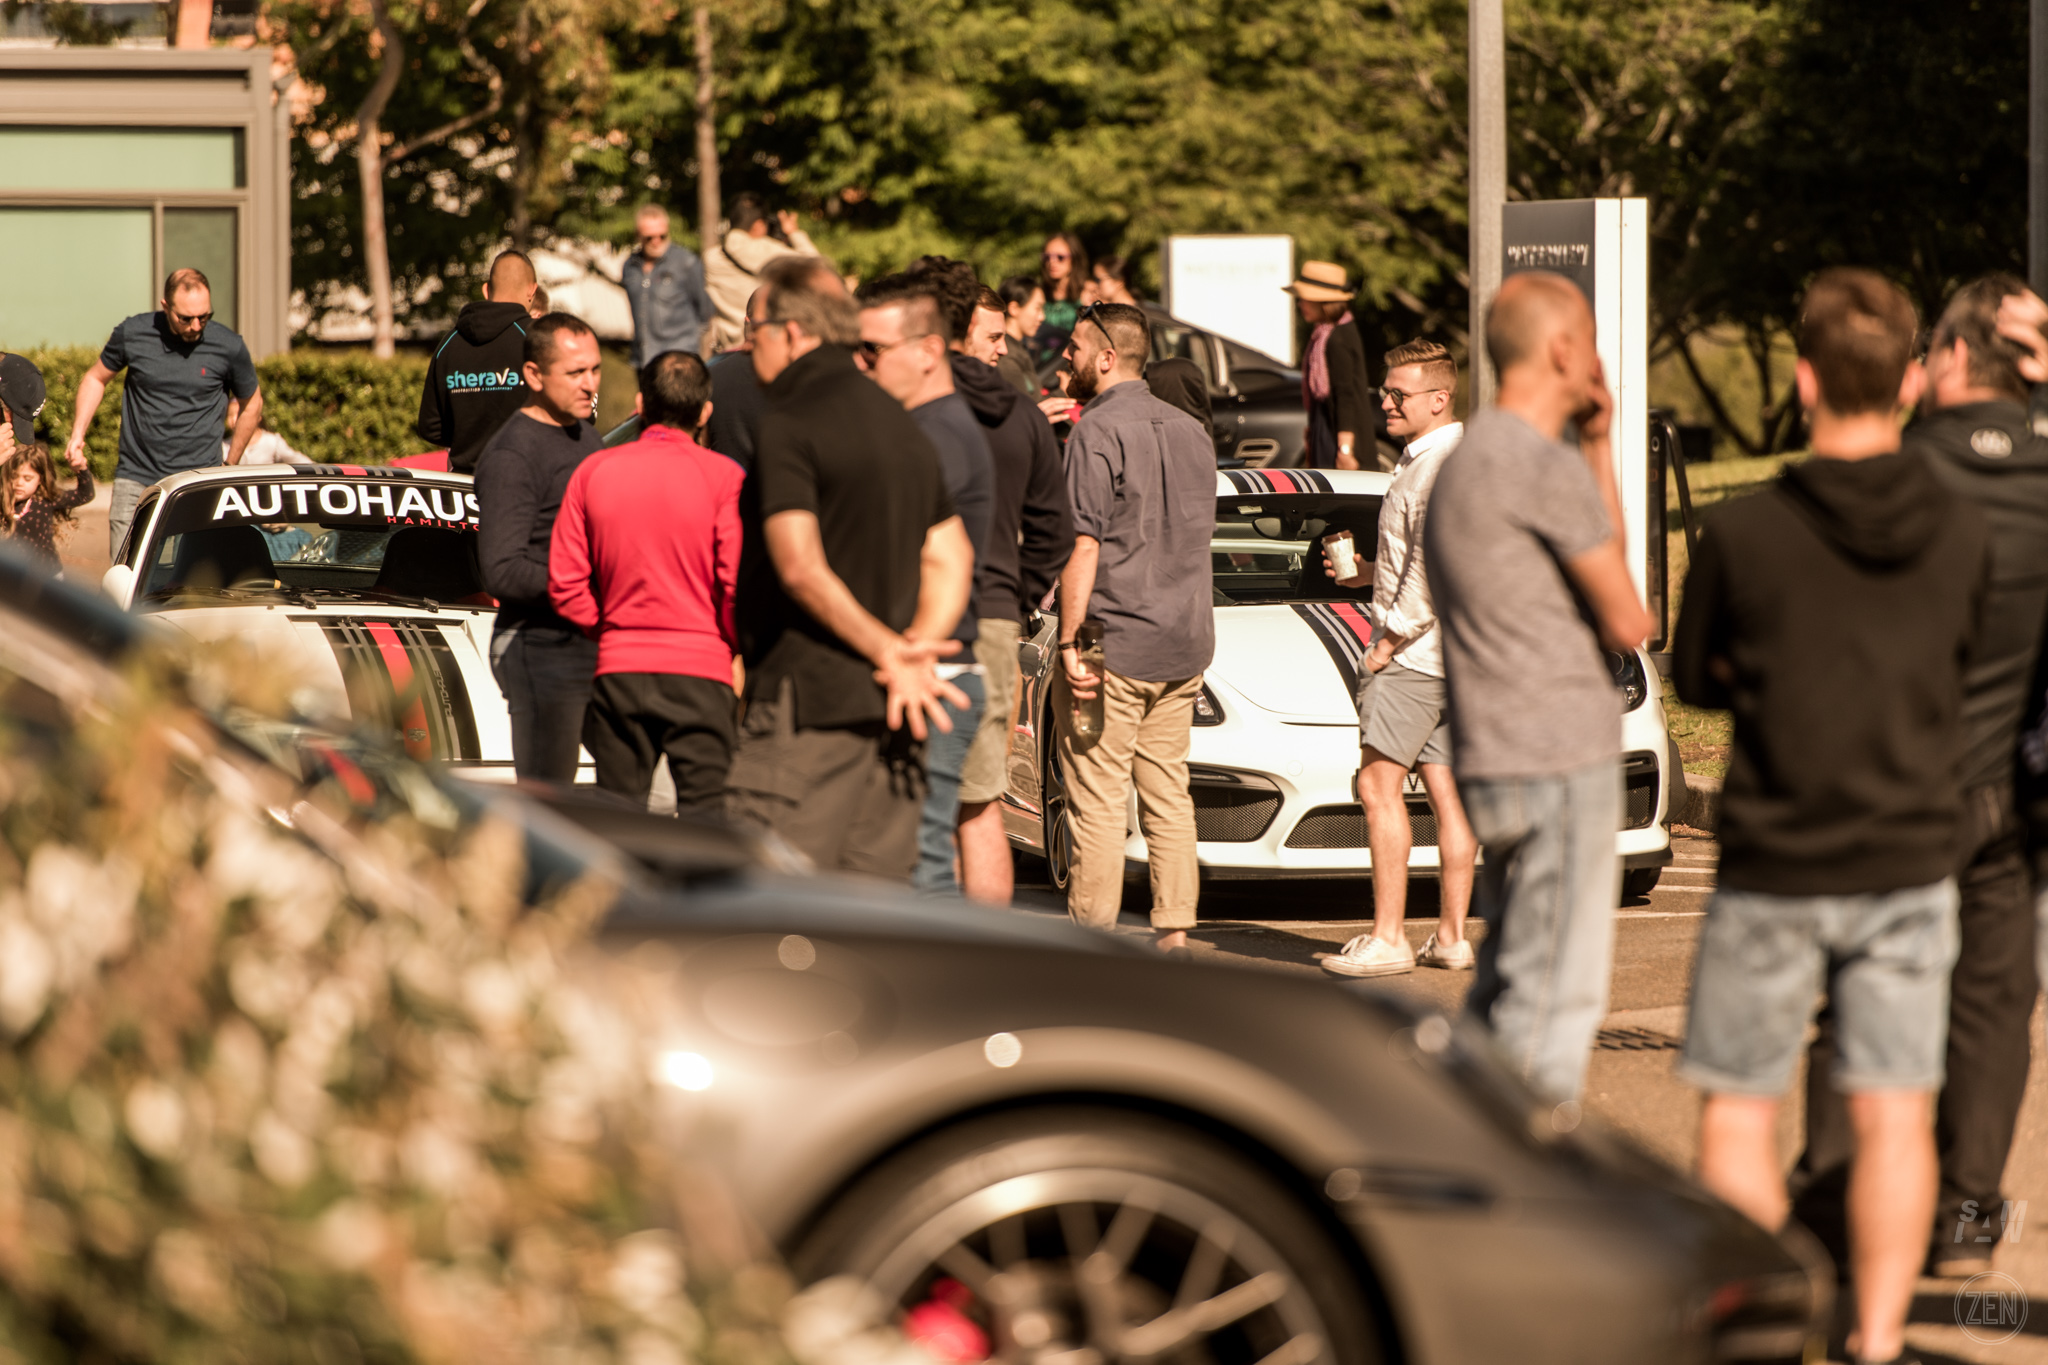 2019-10-27 - Autohaus Porsches & Coffee 154